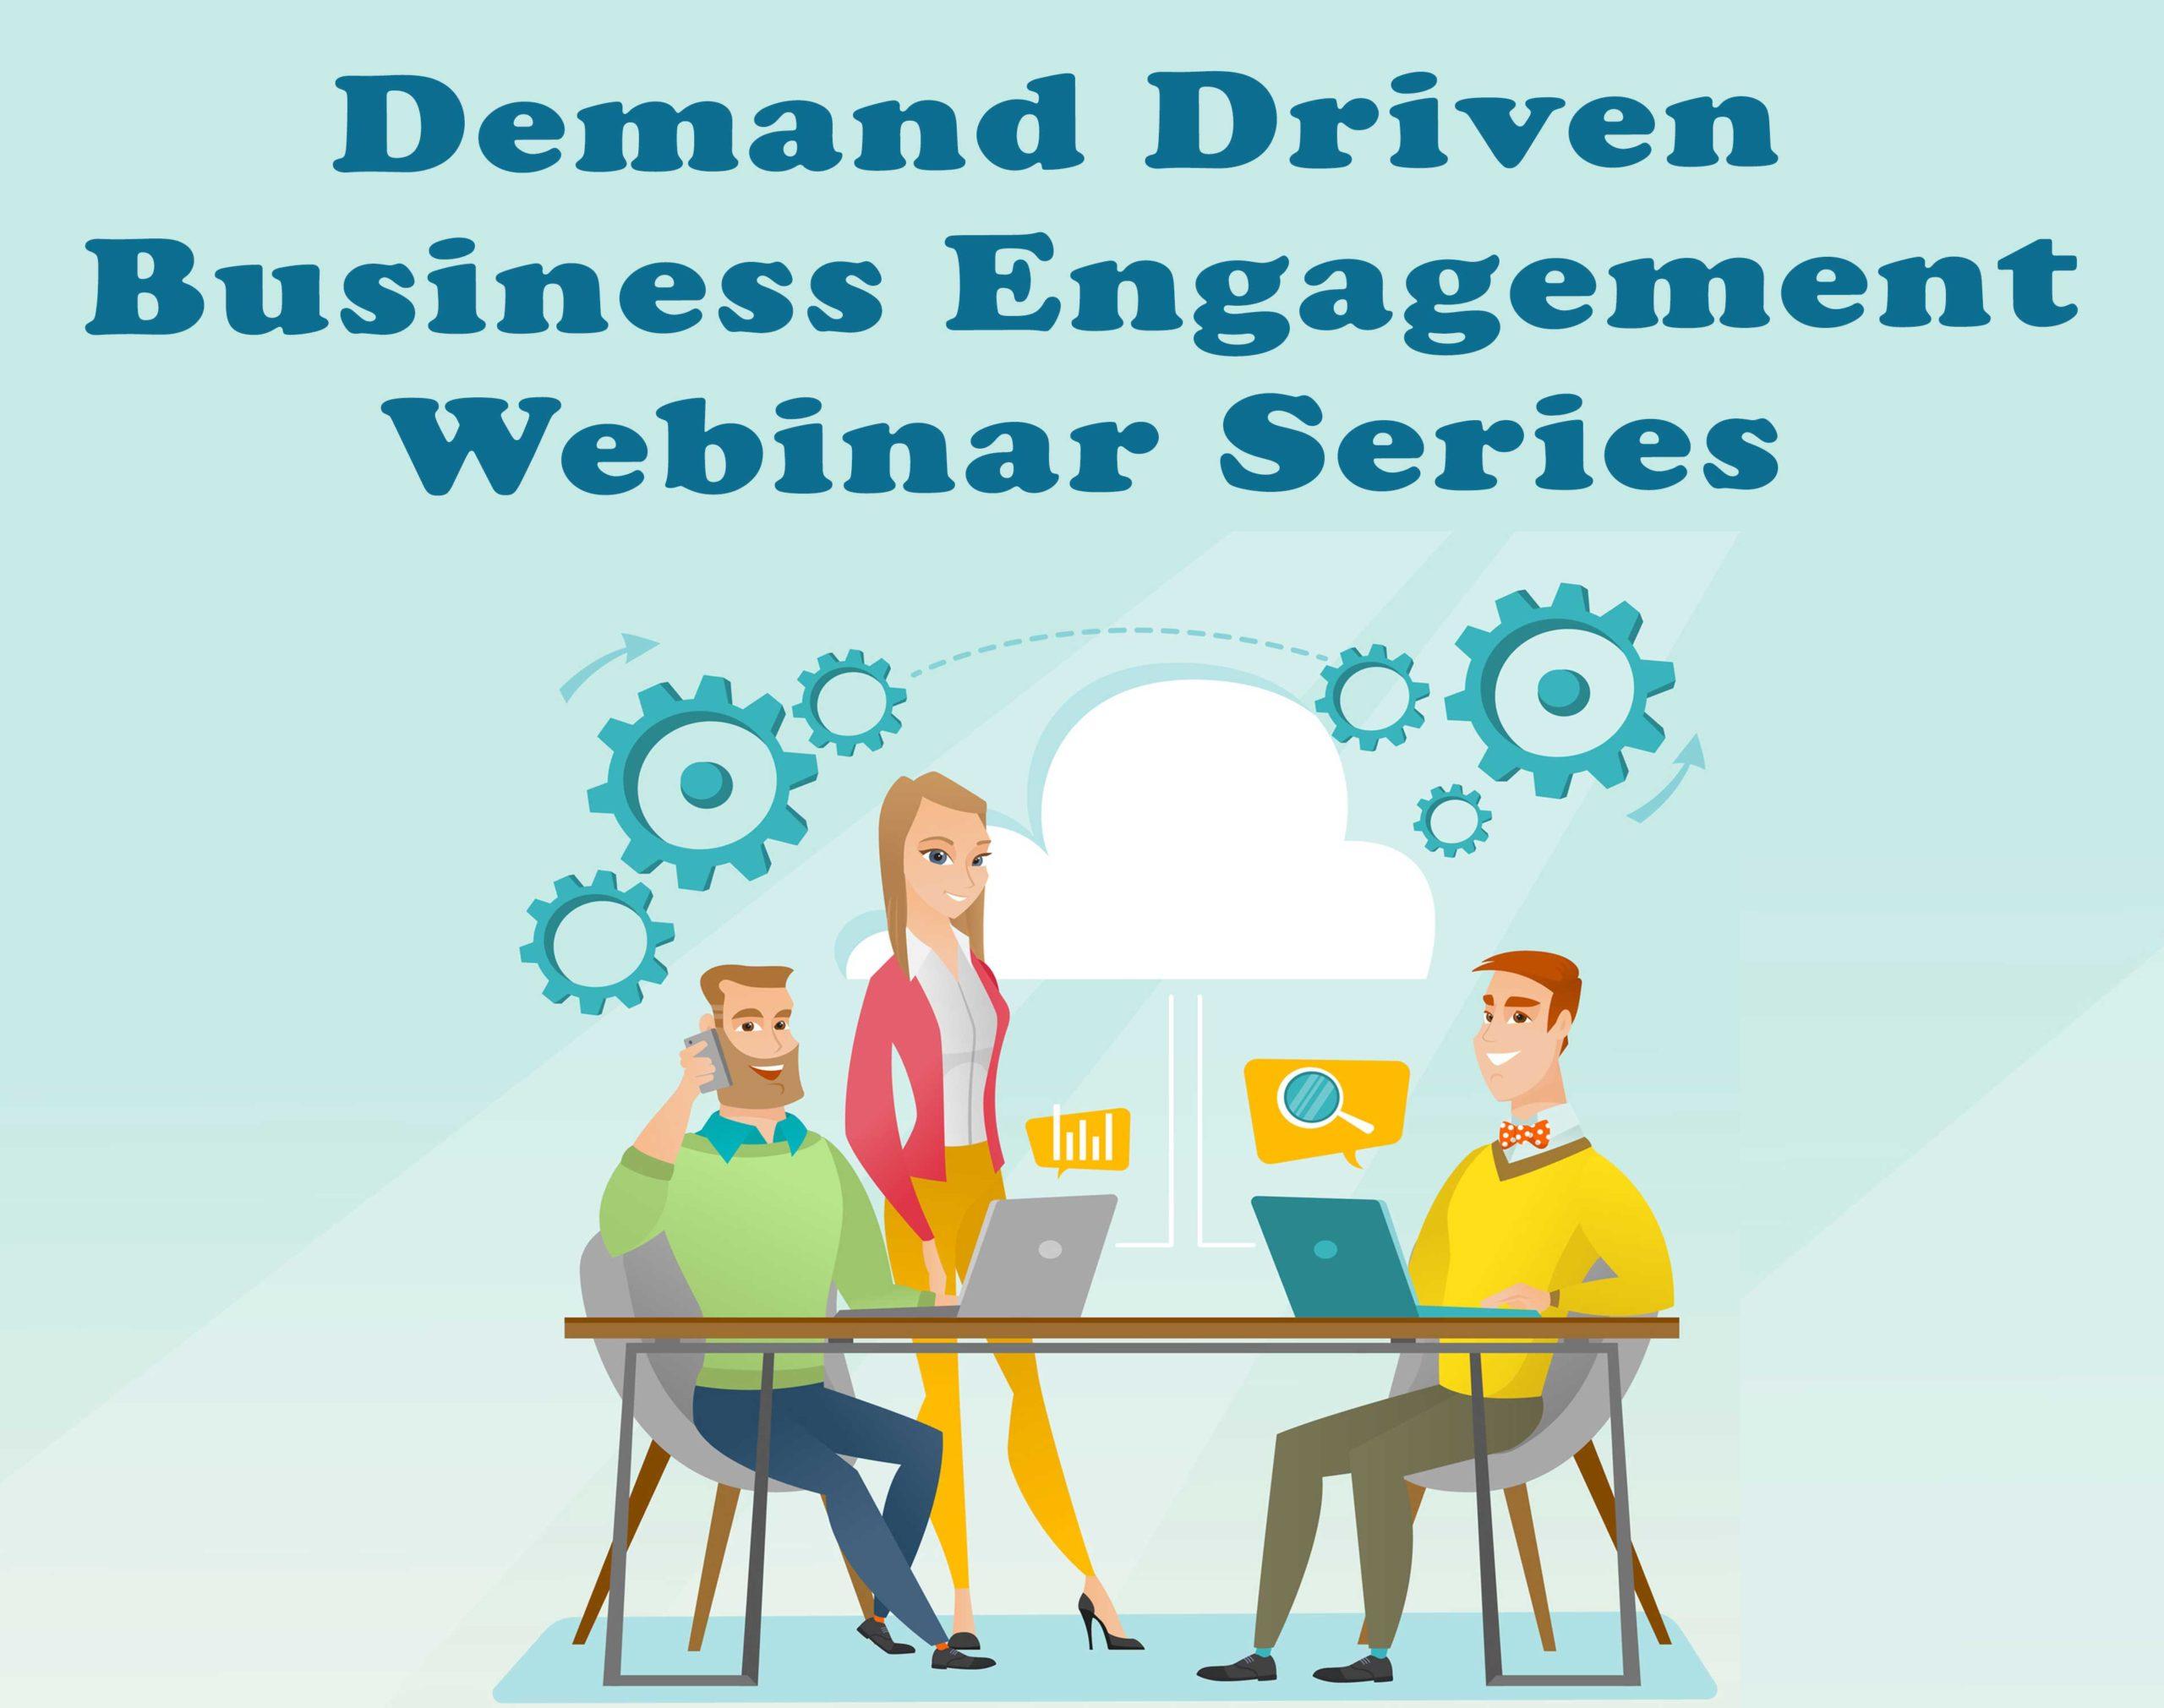 Demand Driven Business Engagement Live Workshops New